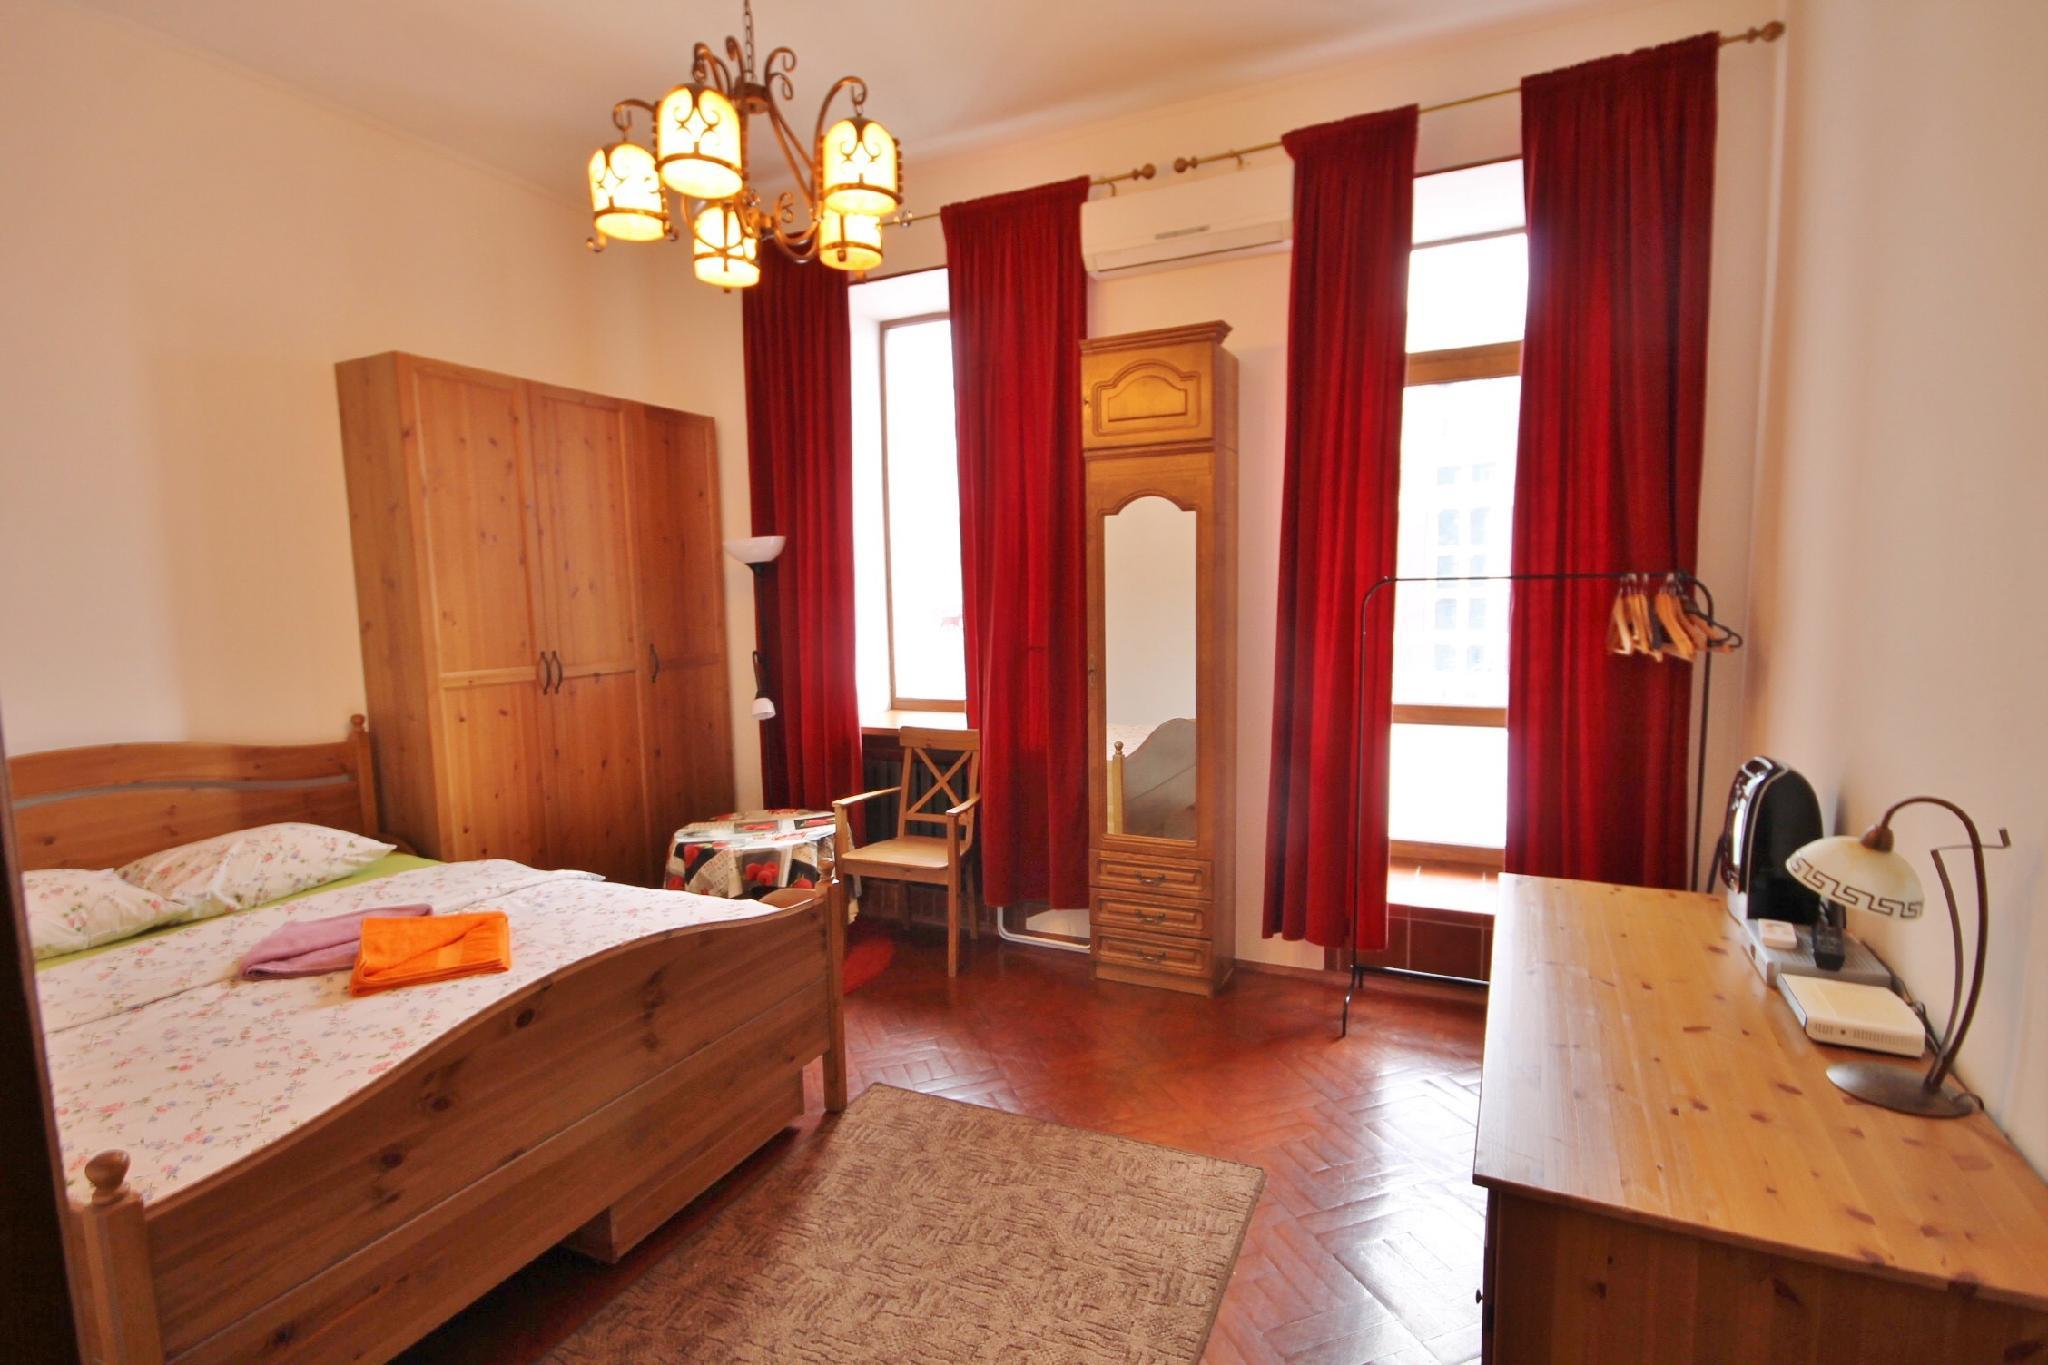 Flats 4 U Apartments Polyanka